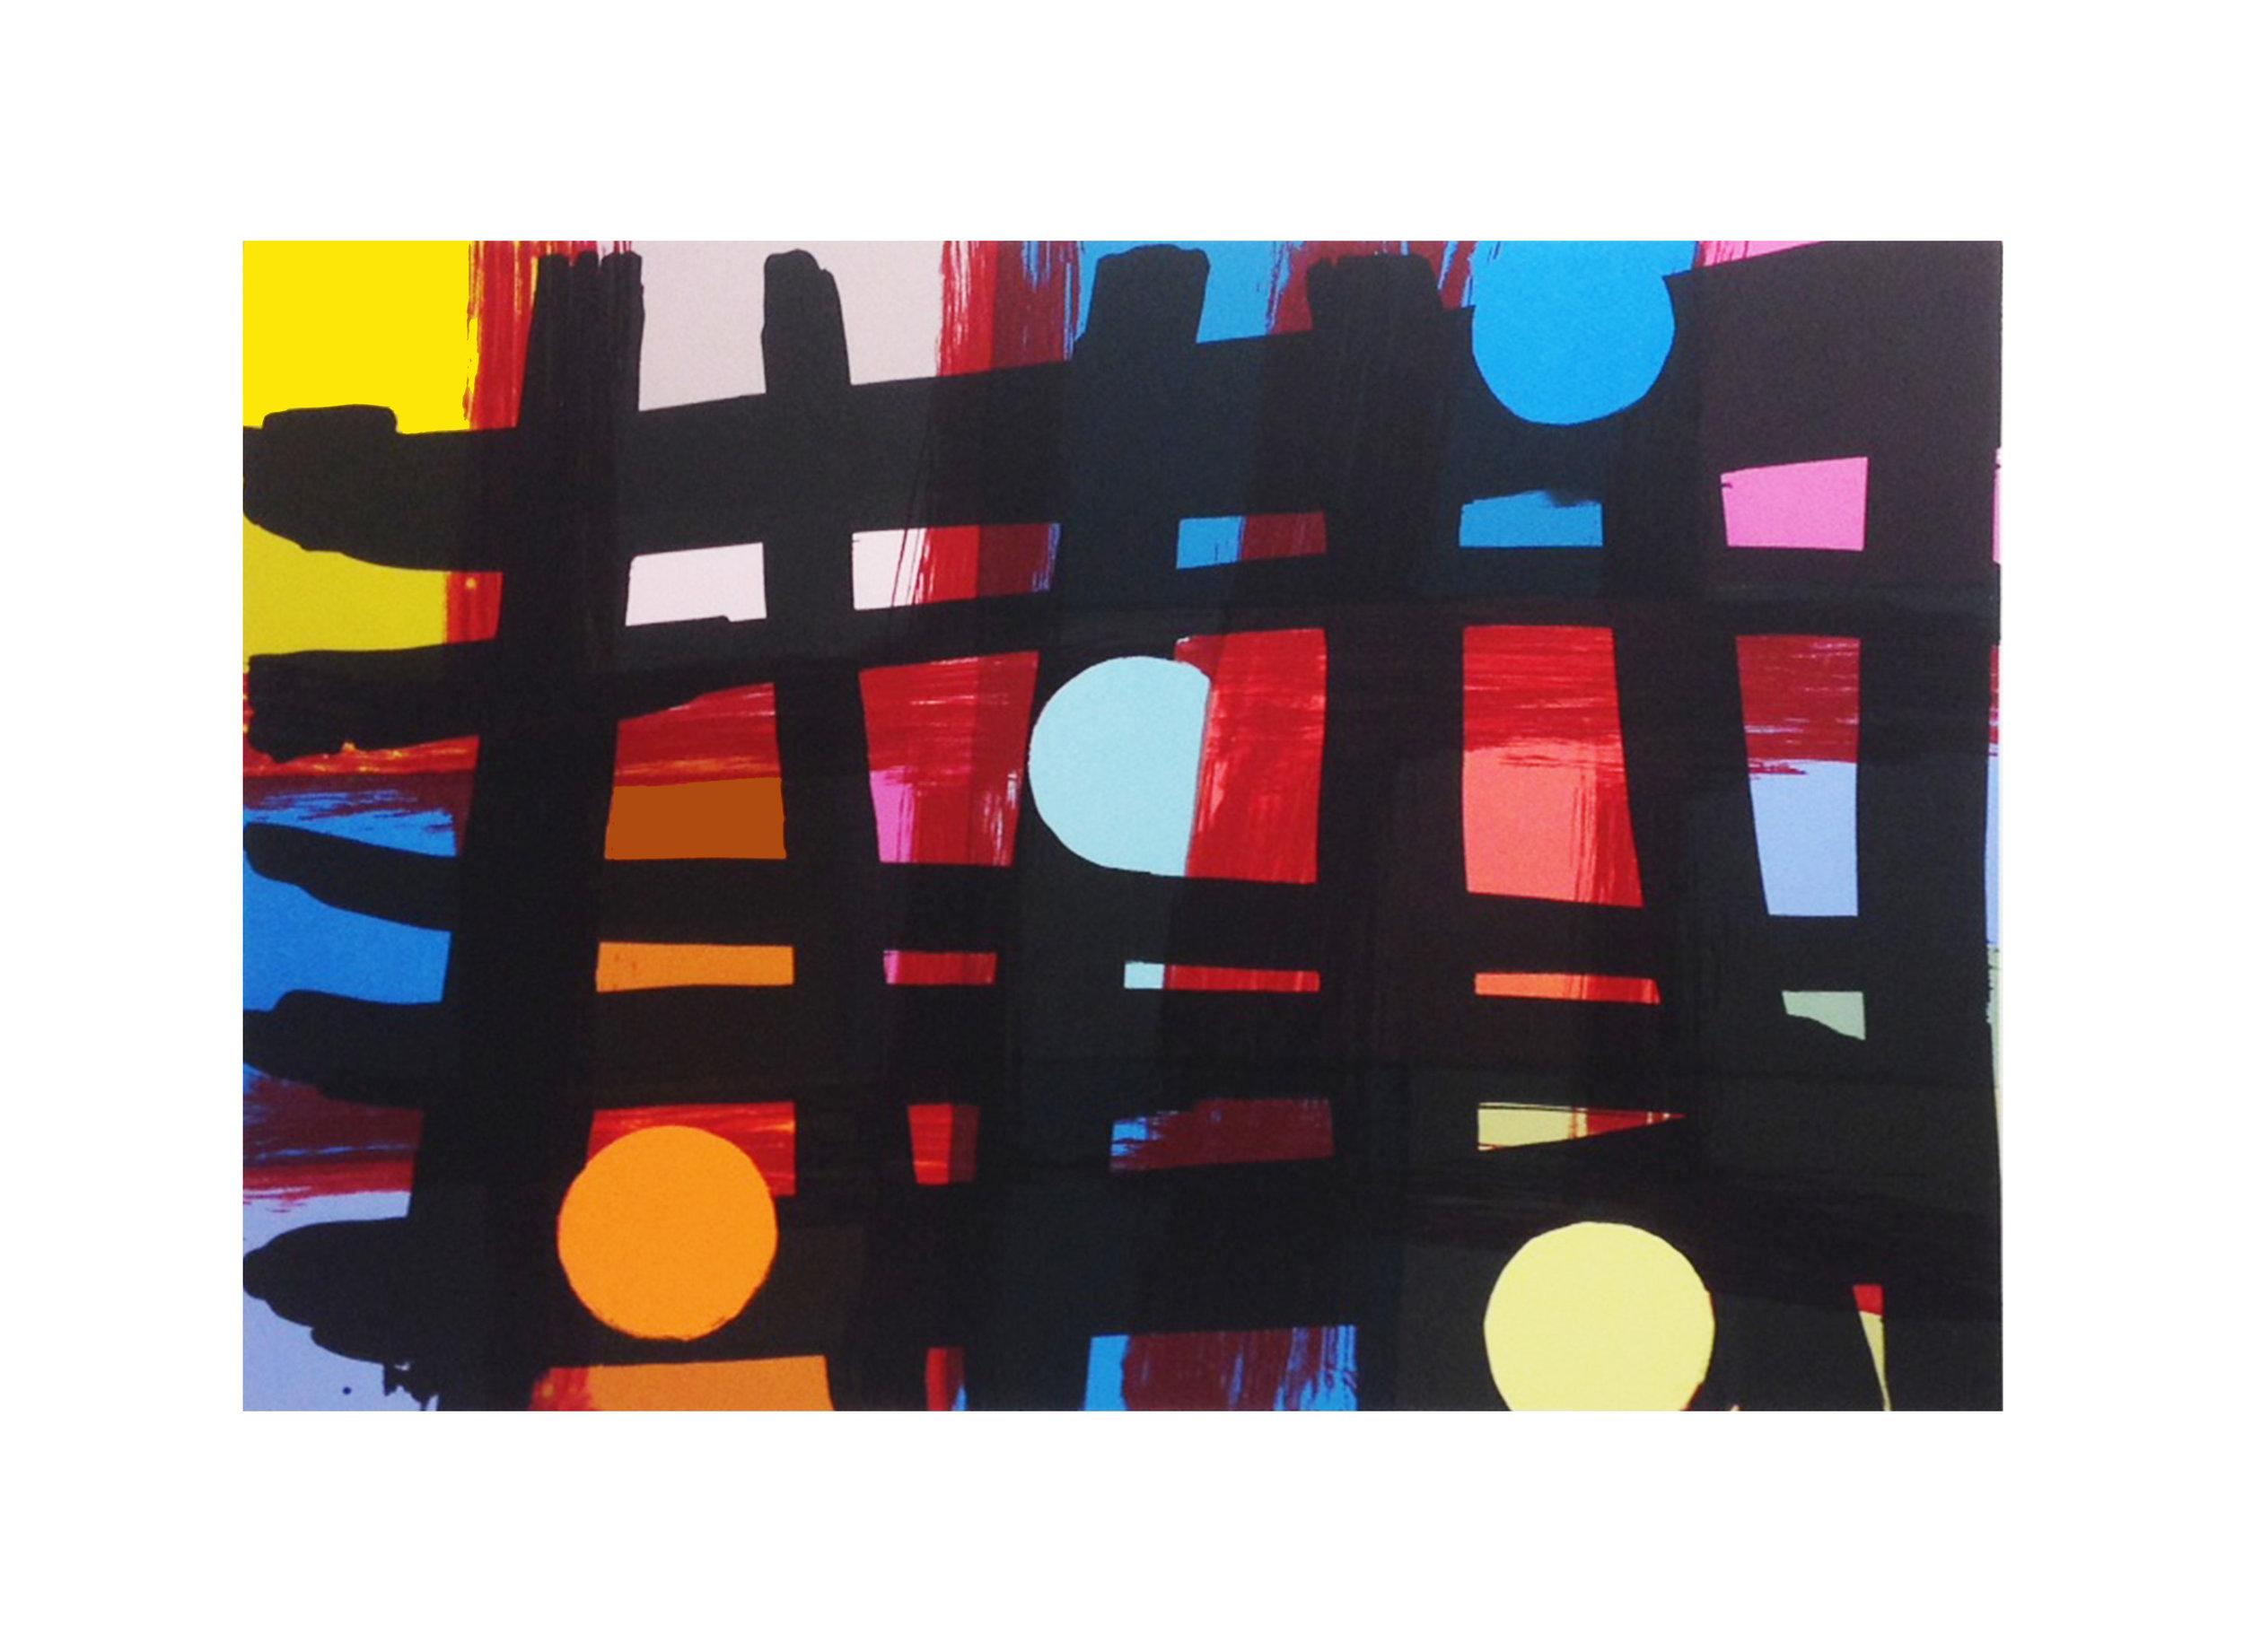 Mali Morris   RA, Staith    Date: 2018  Size (cm - unframed): 55.5 x 73.5 cm  Technique: Screenprint  Materials: Somerset Velvet 300gsm  Edition size: 30  Publisher: The Print Studio  Copyright: The Artist   P.O.A